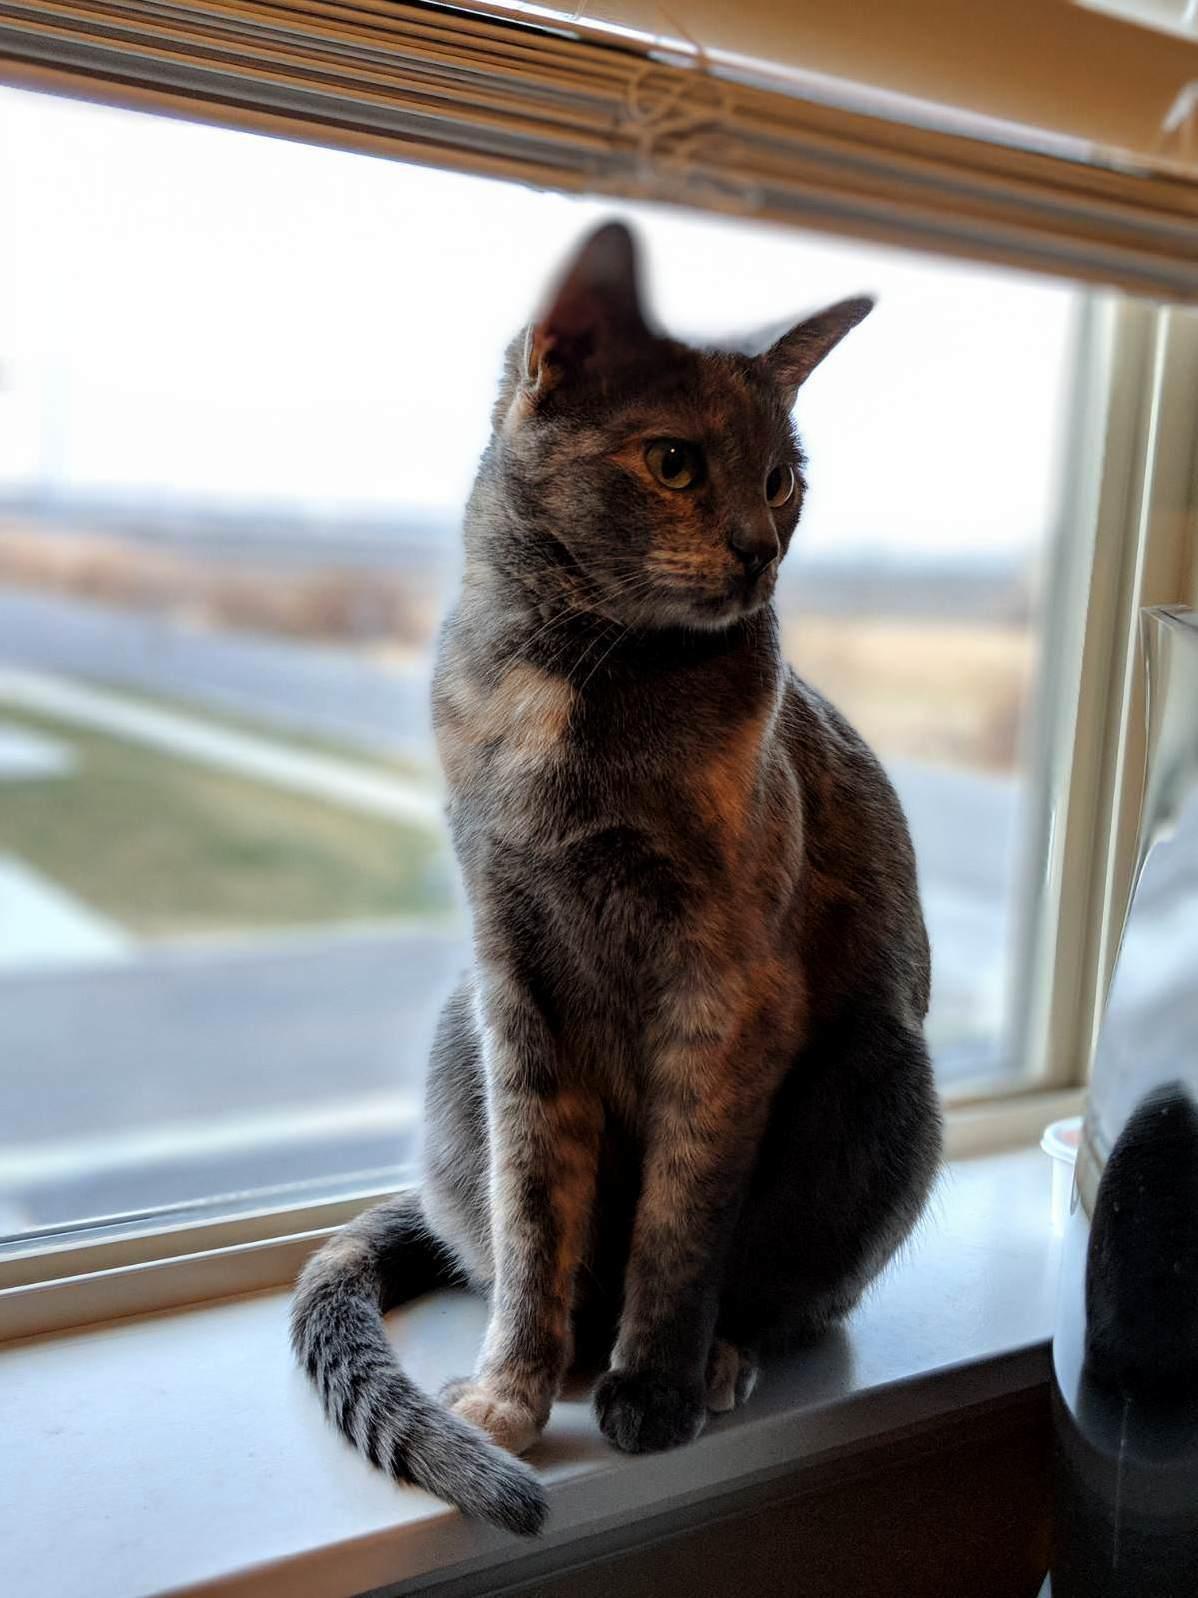 My girl atari. she poses everytime i sit at my desk